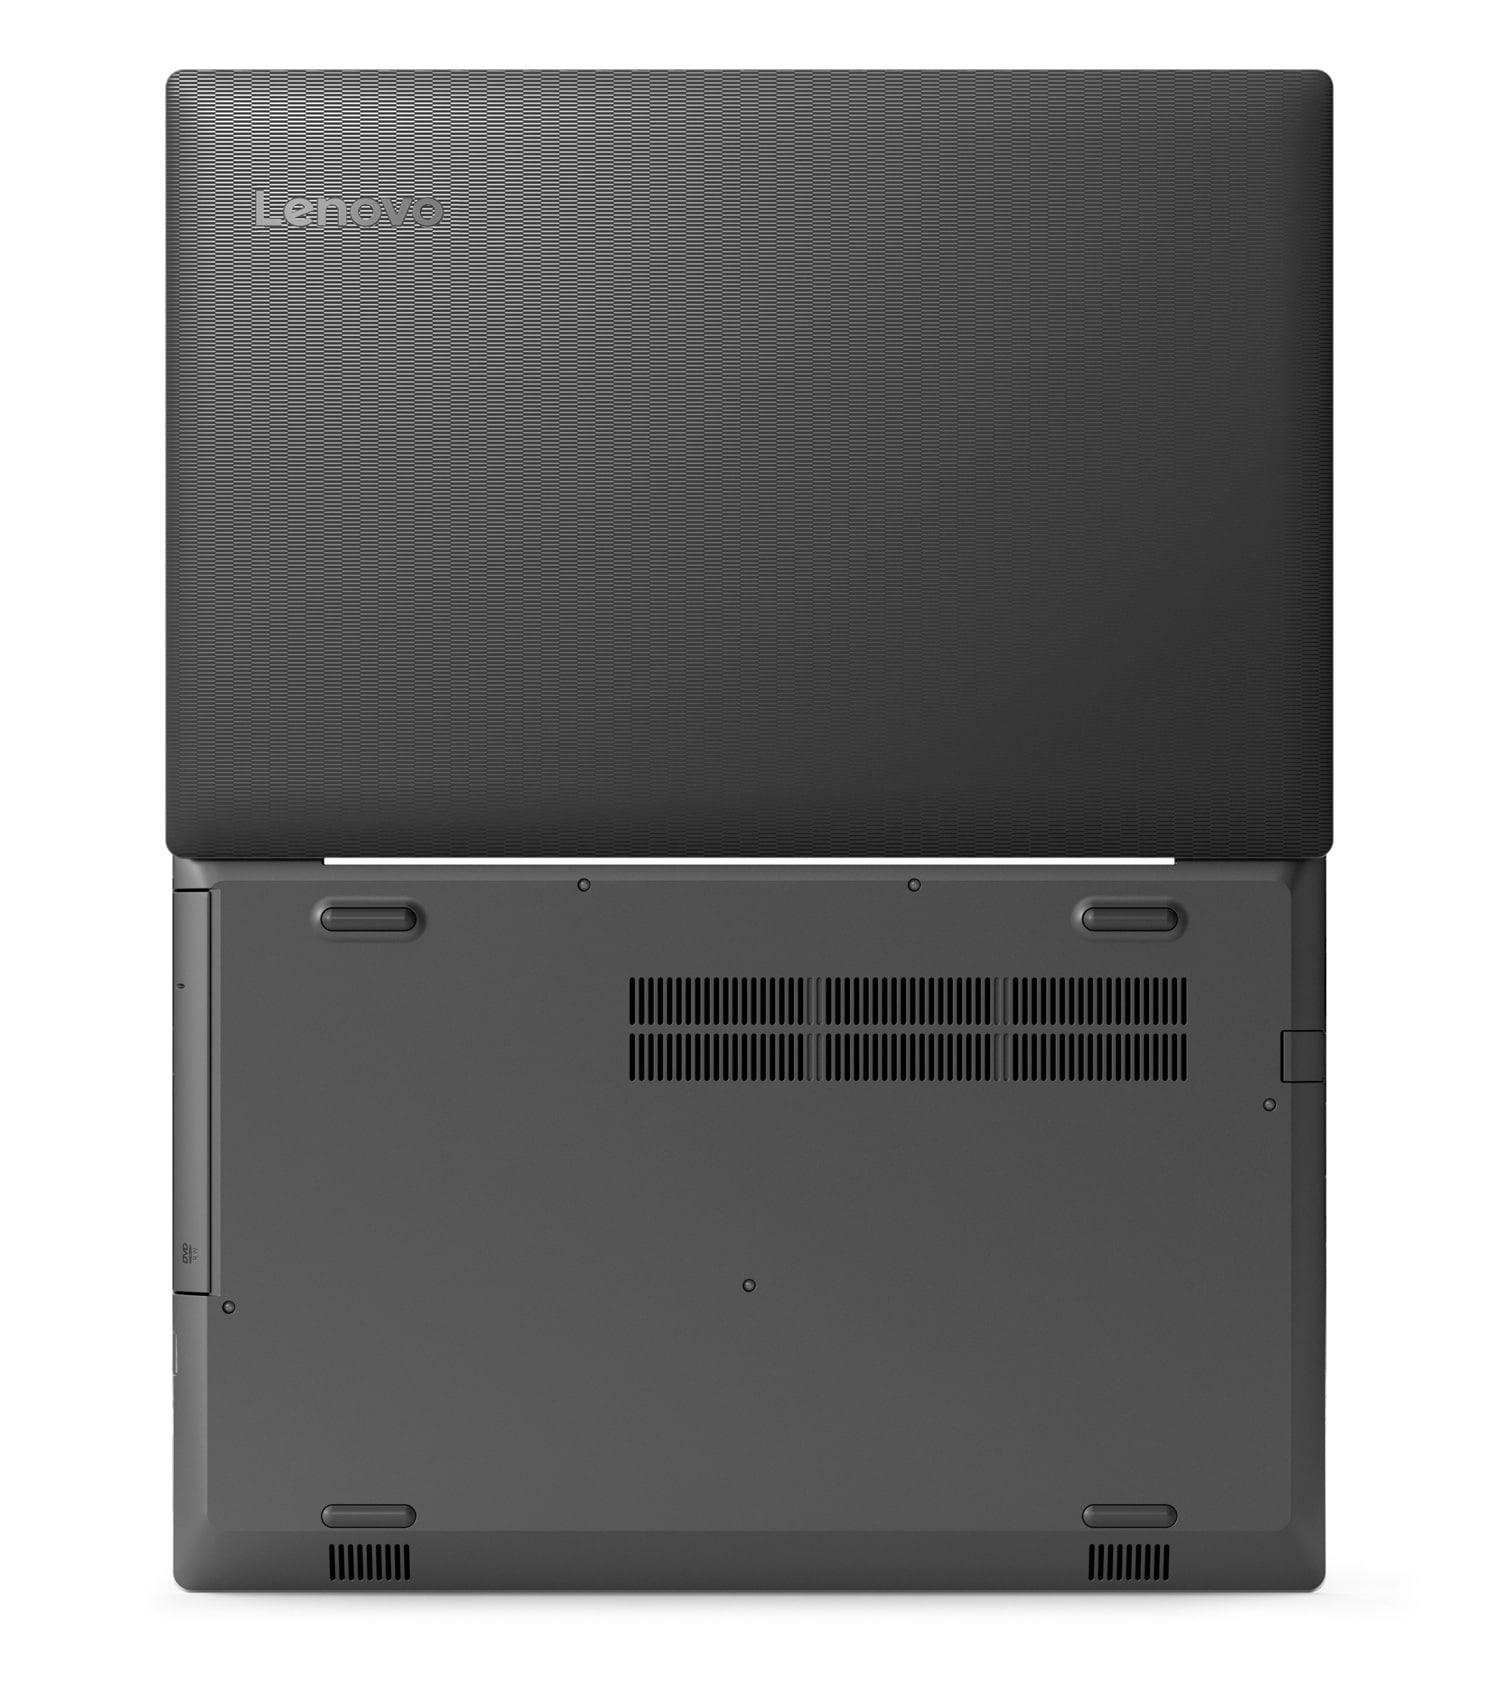 "Lenovo V130-15IKB, PC portable 15"" DVD rapide léger (449€)"